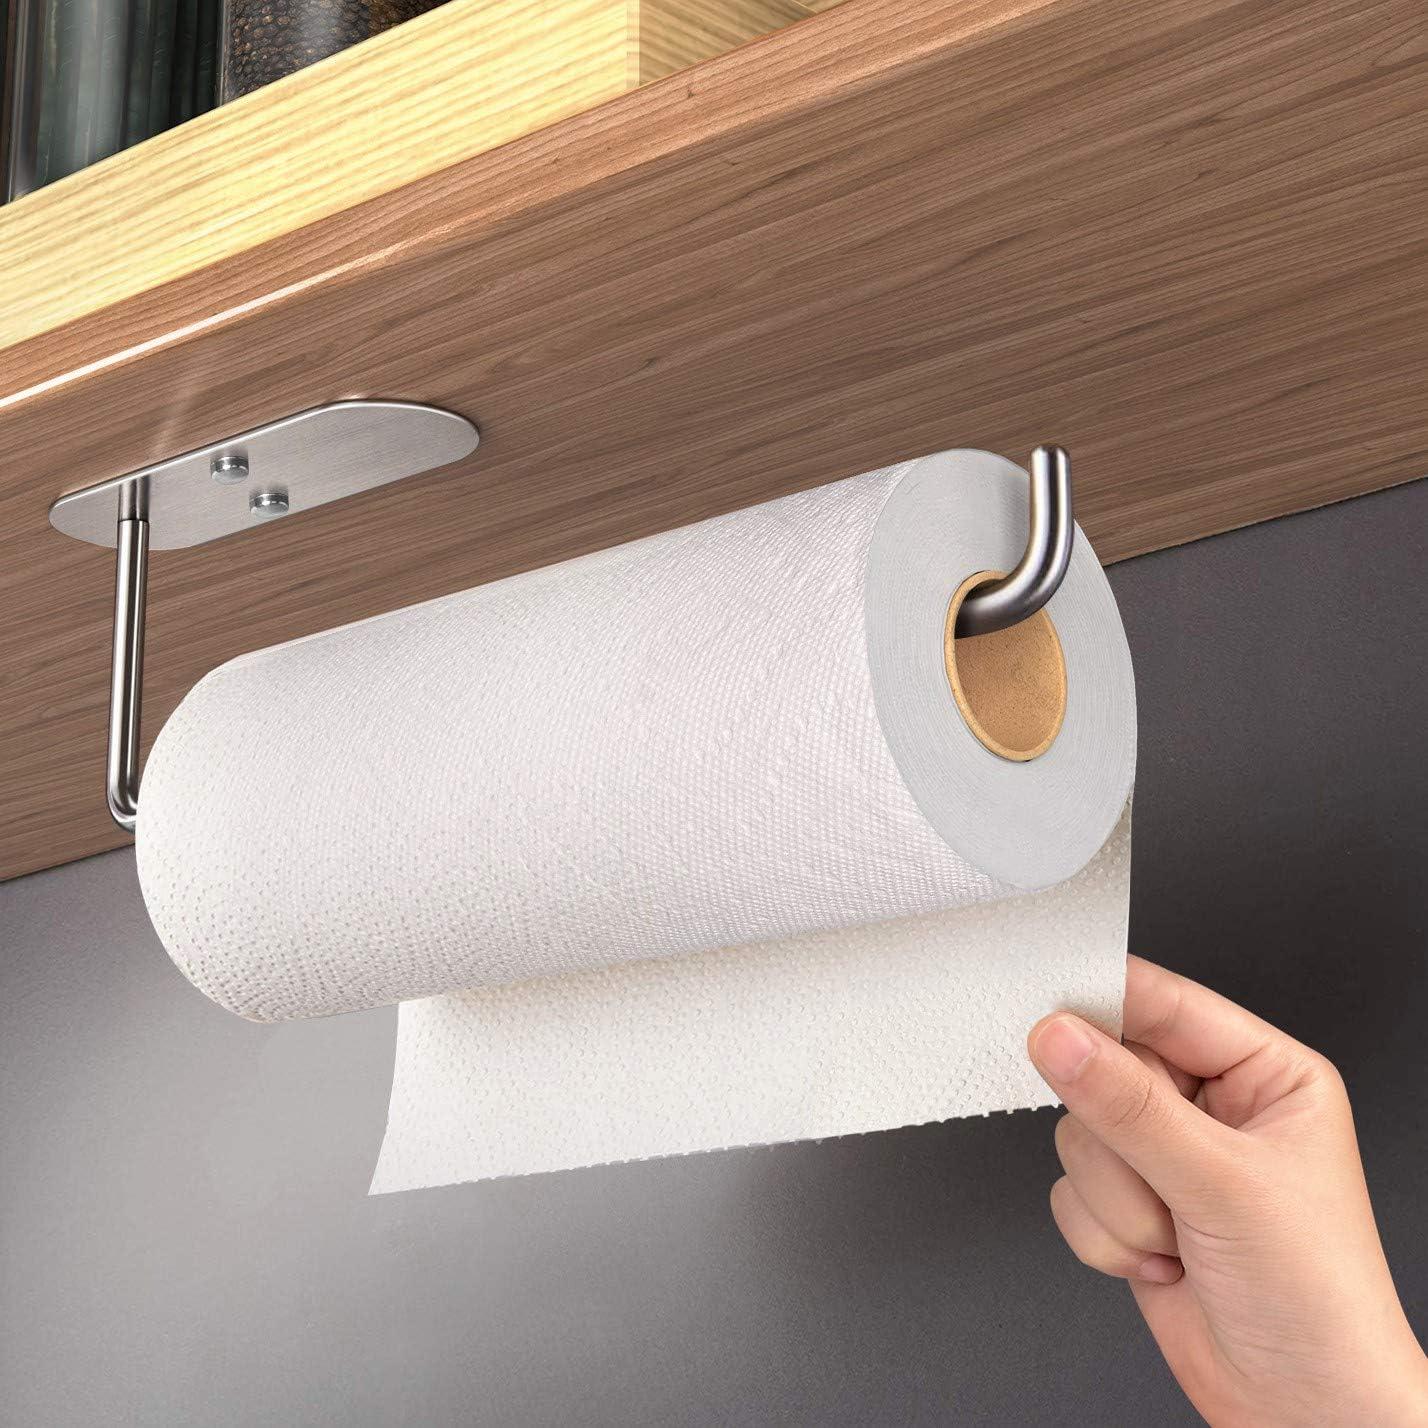 HUFEEOH Paper Towel Holder Attention brand Under Kitchen Regular store Cabinet Mount for